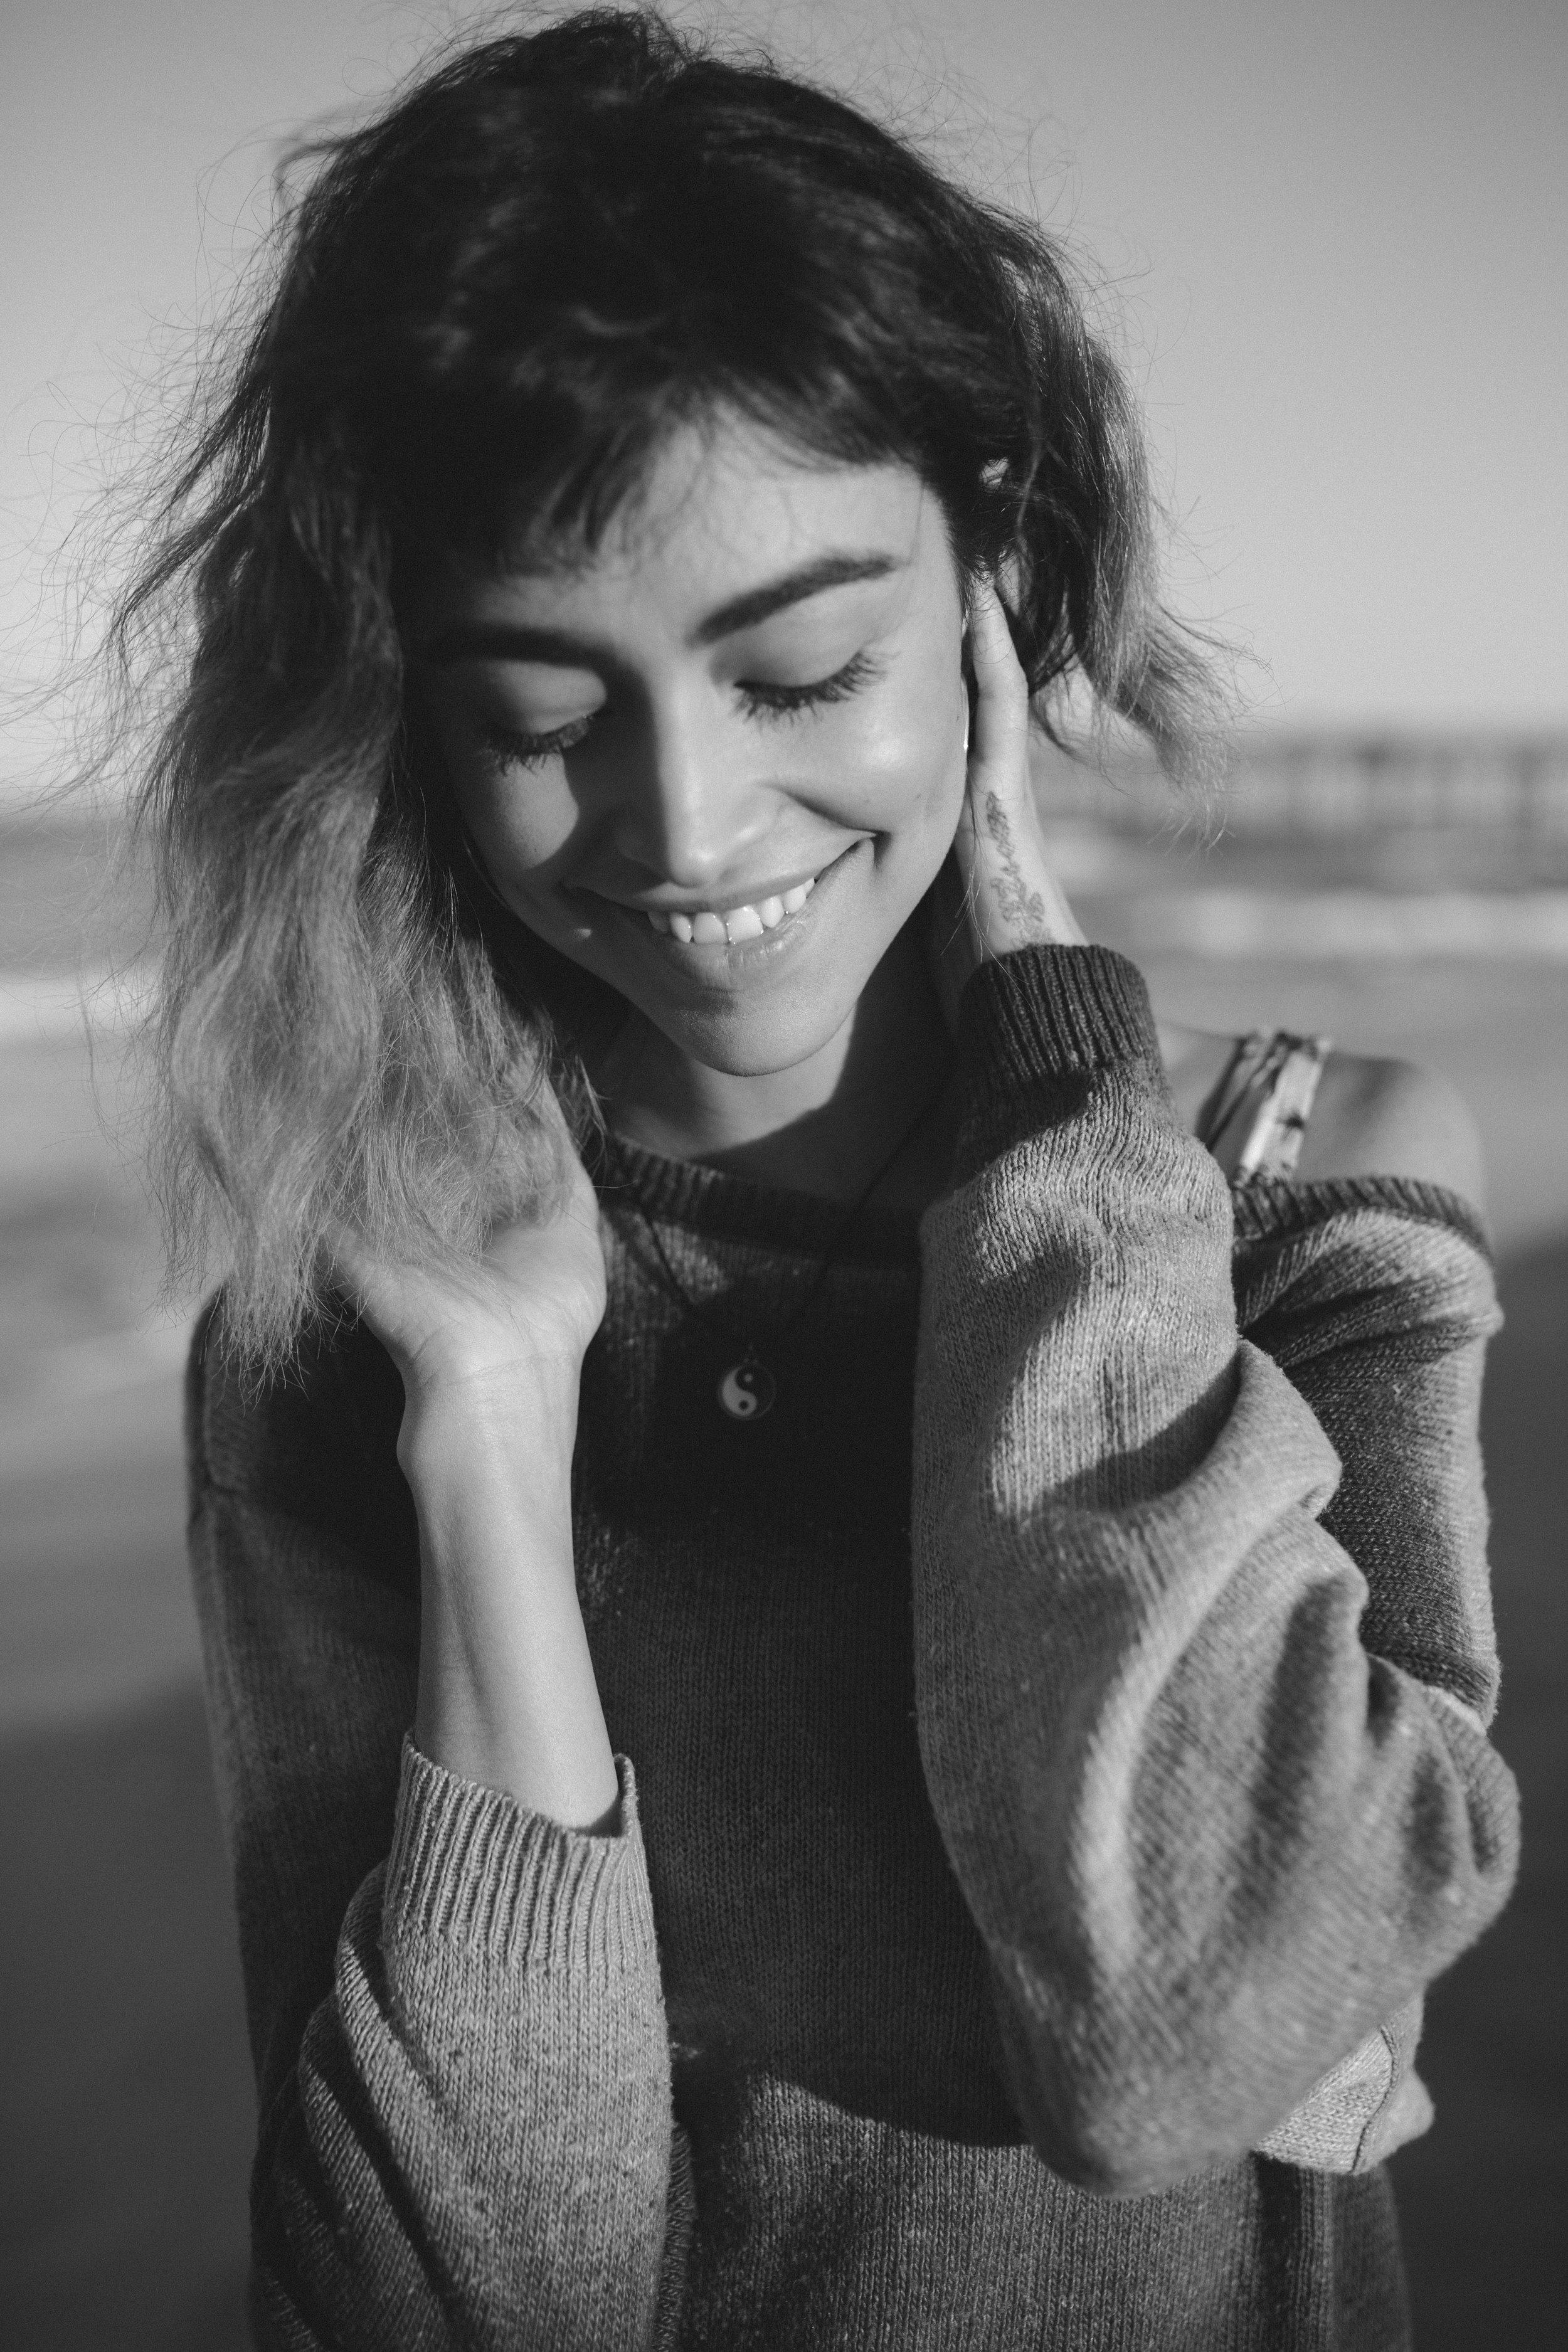 florida-flagler-beach-portrait-photographer-ocean